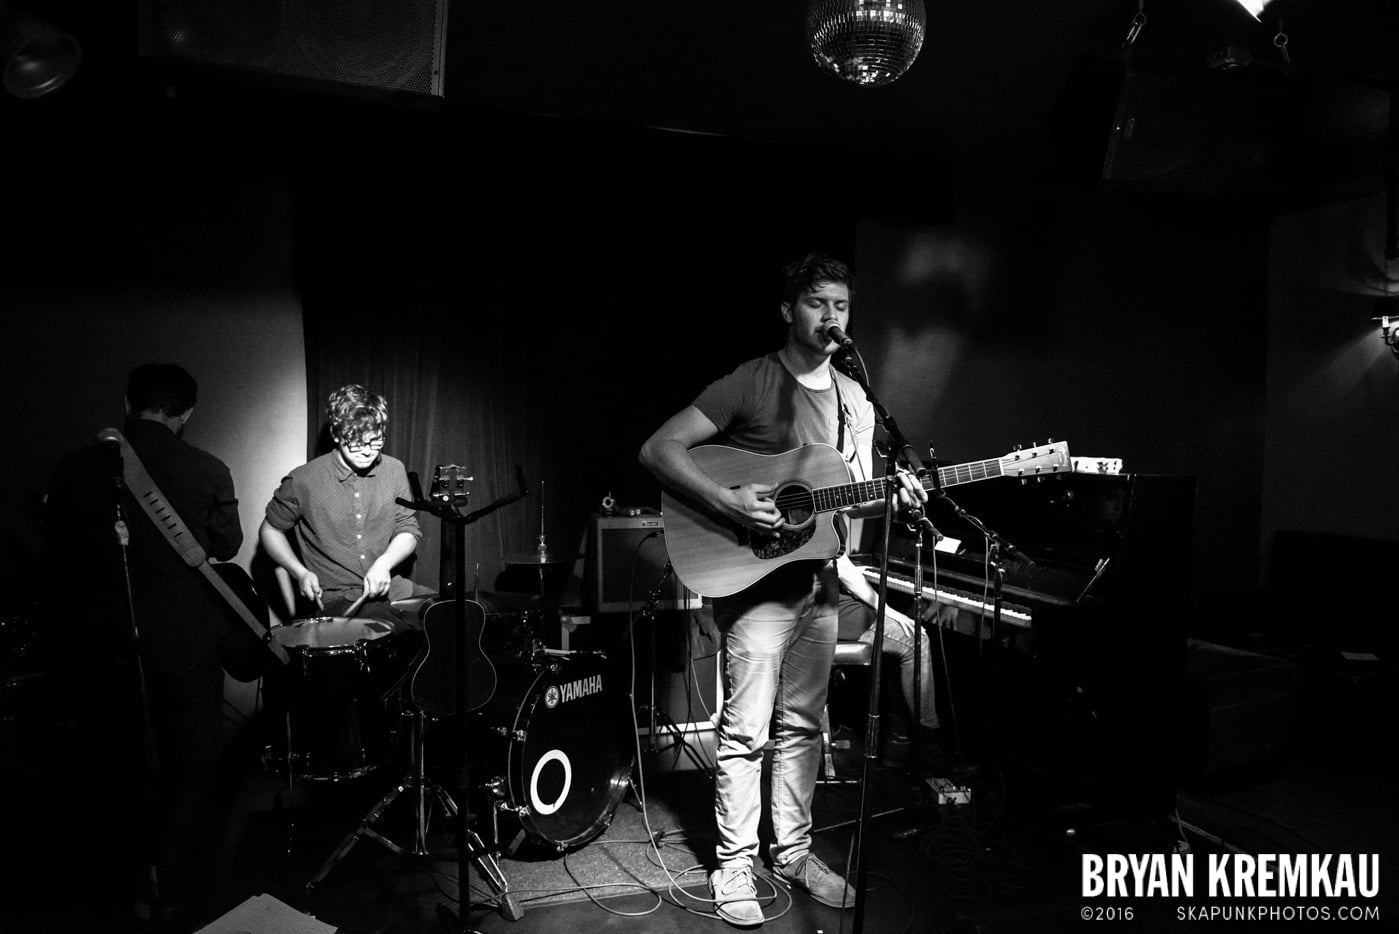 Jordan Klassen @ Bowery Electric, NYC - 10.9.13 (15)